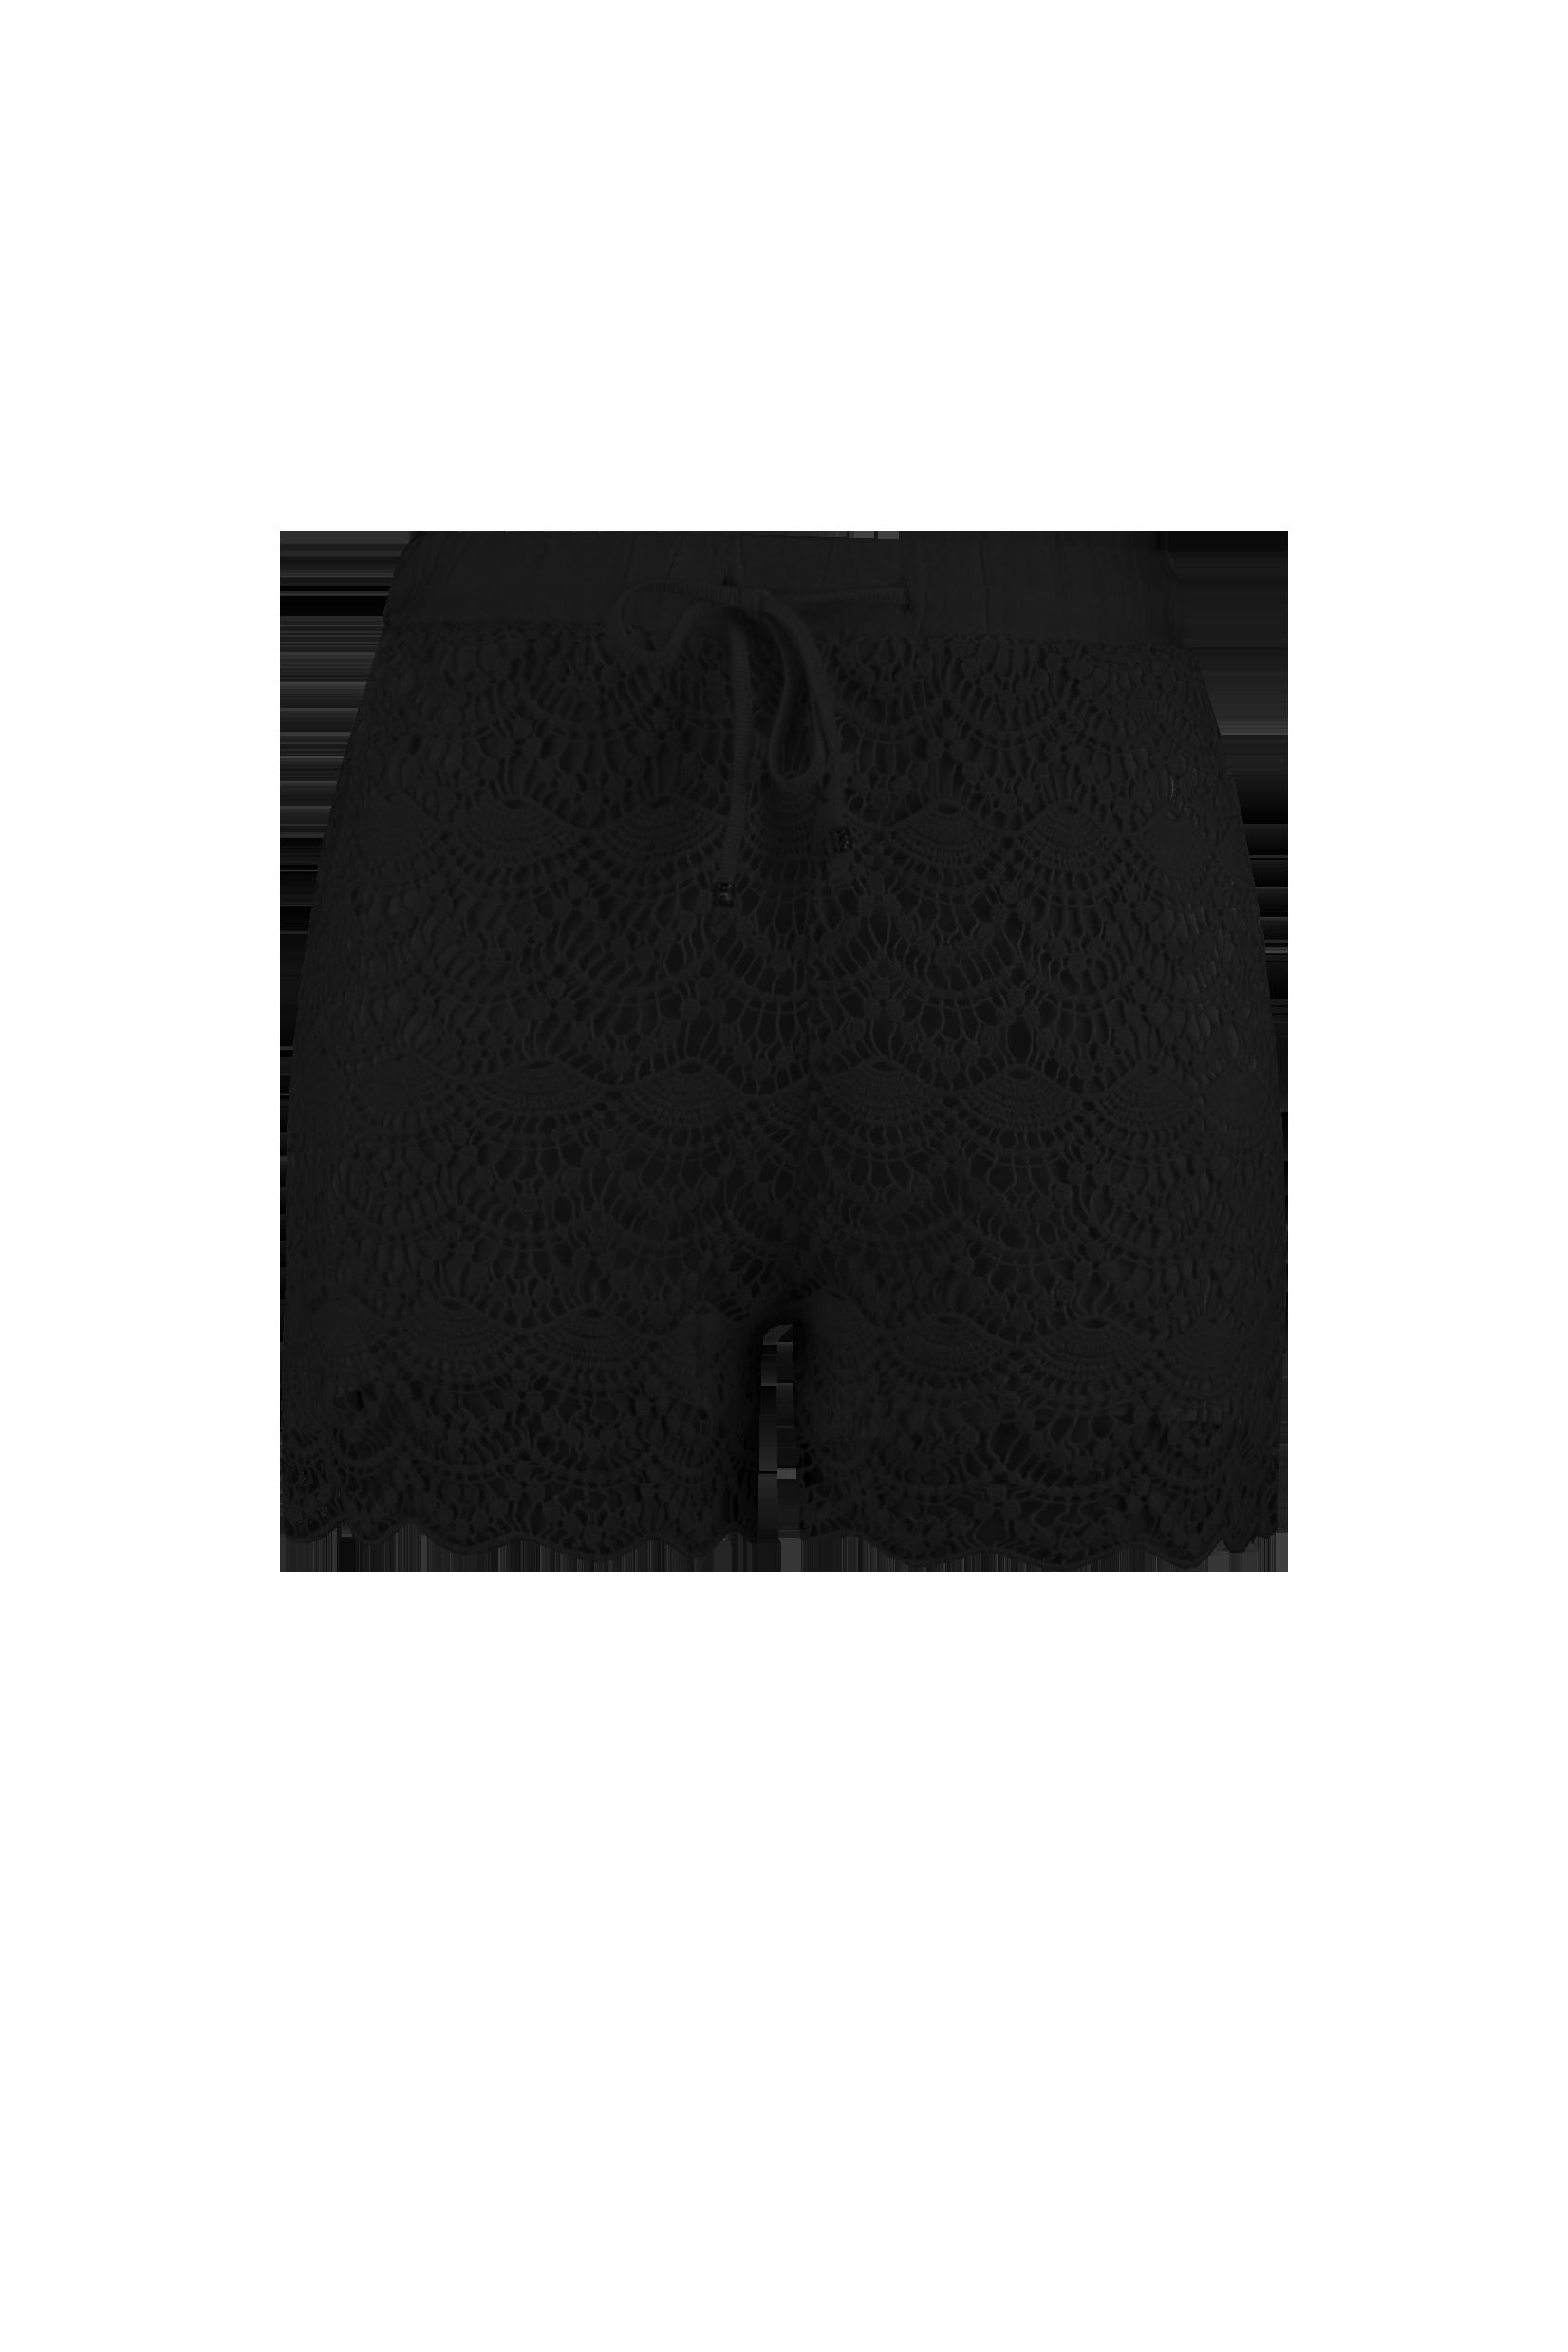 Nette Korte Broek Dames.Shorts Online Kopen Fashionchick Nl Groot Aanbod